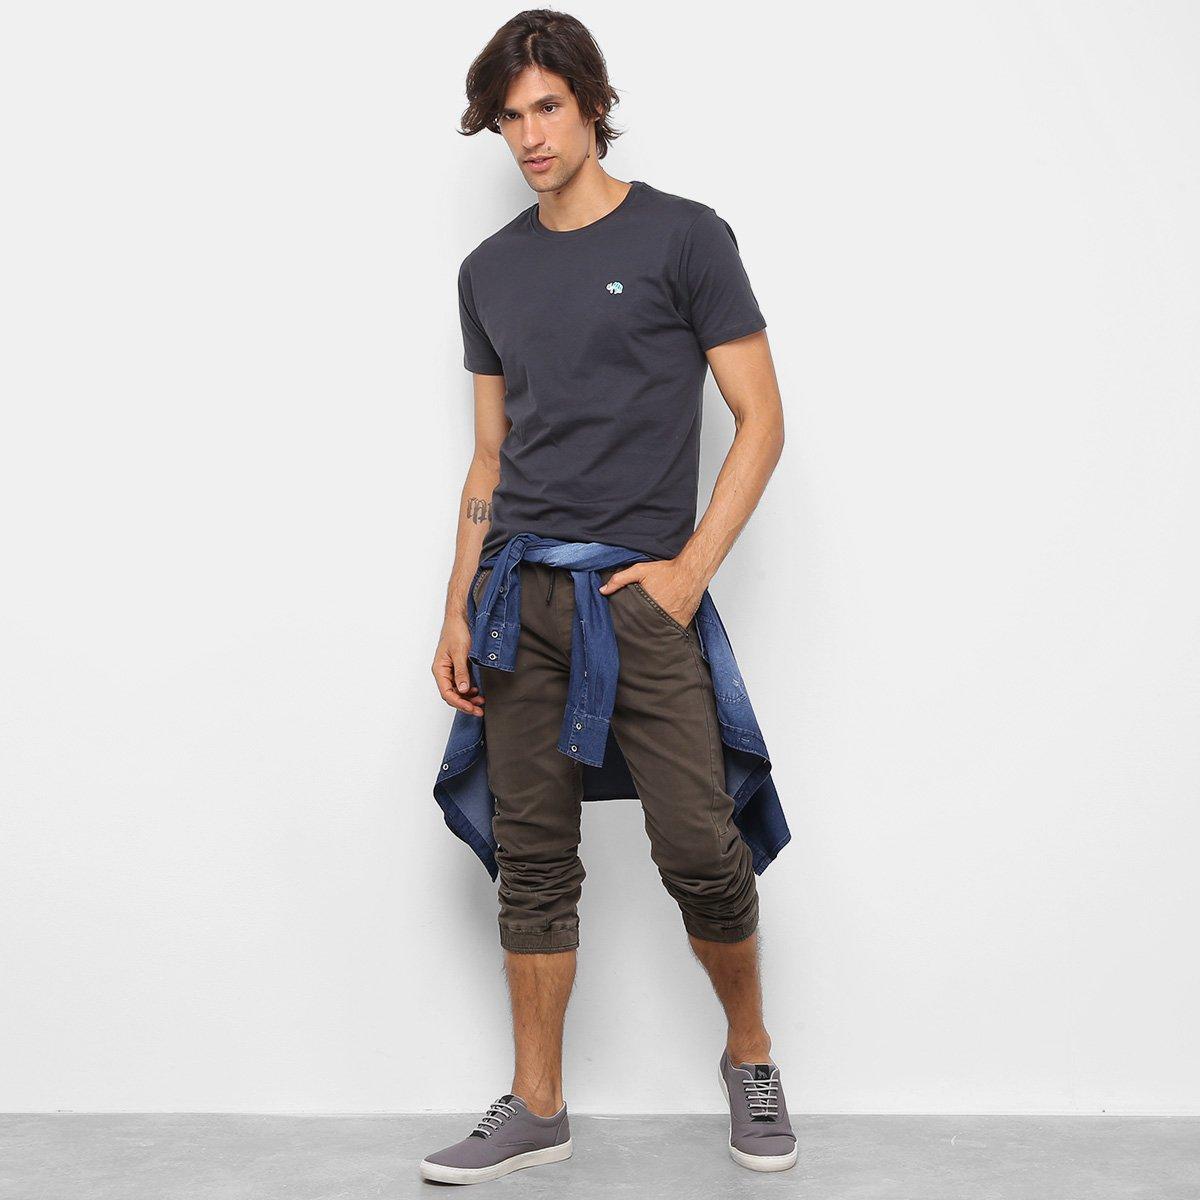 Camiseta T-Shirt Gajang Básica Masculina - Cinza Claro Xc2n1